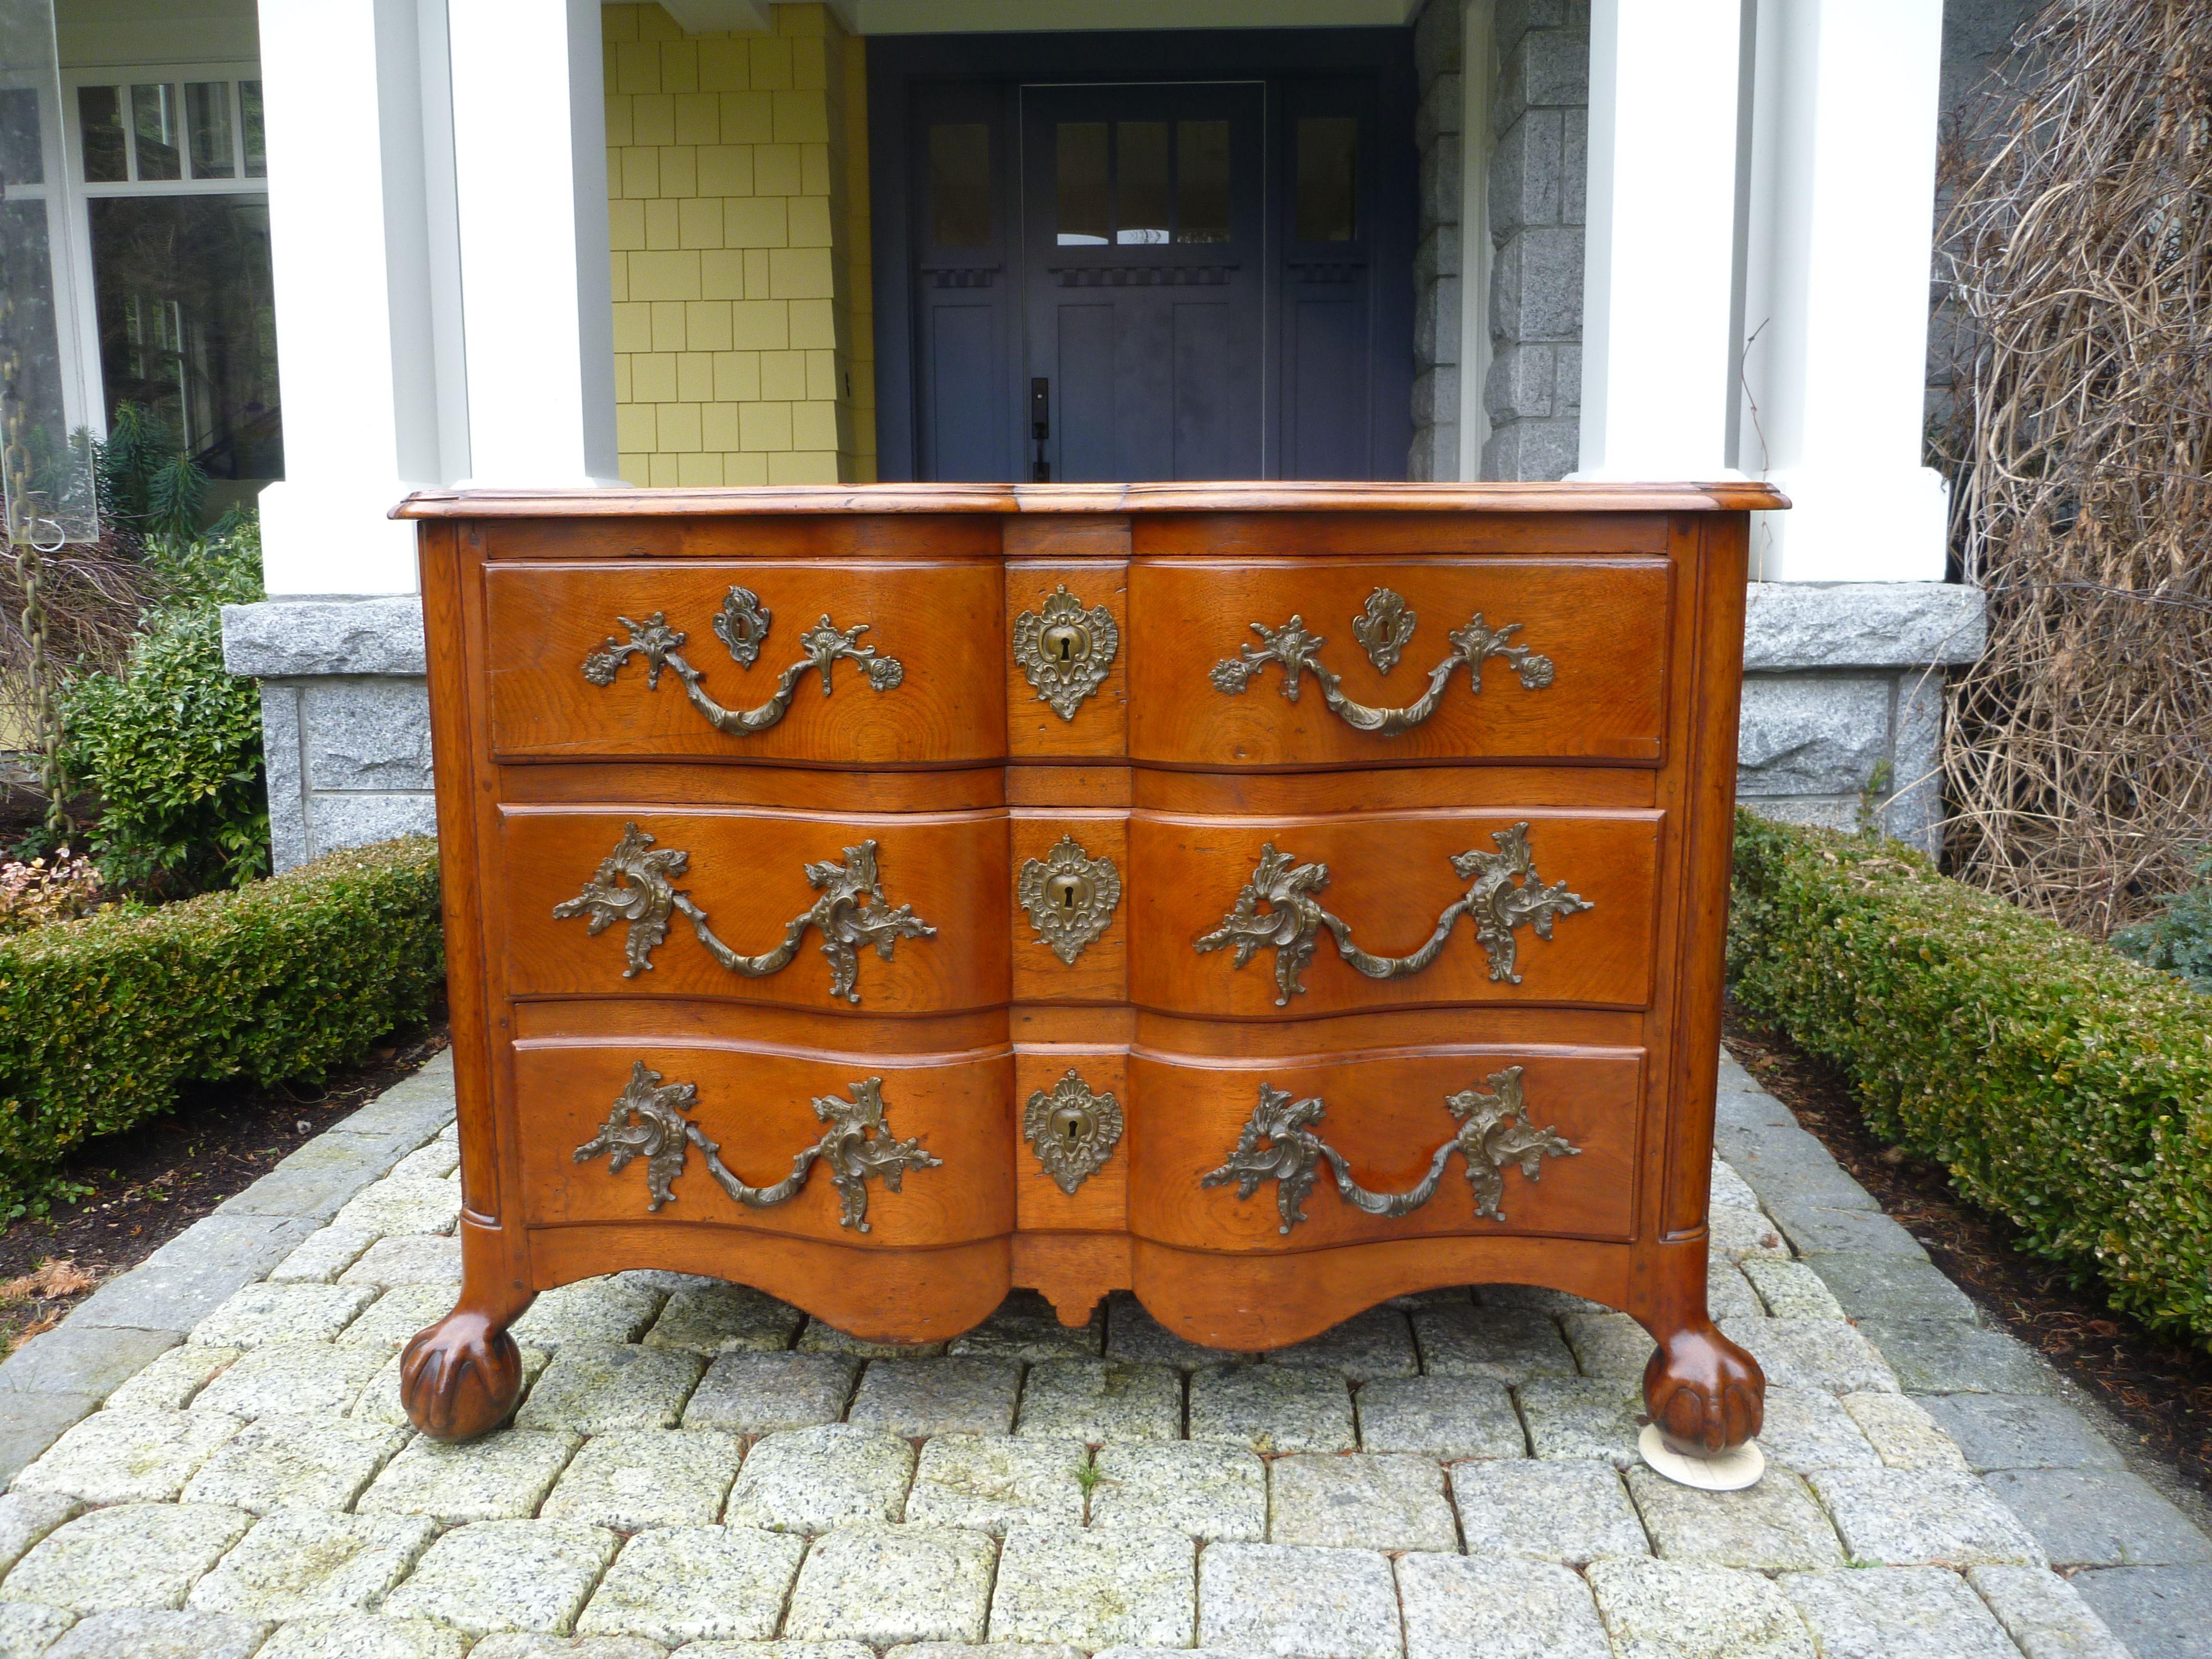 Montreal Butternut Arbalete Commode 18th Century Furniture Antique Furniture Art Decor